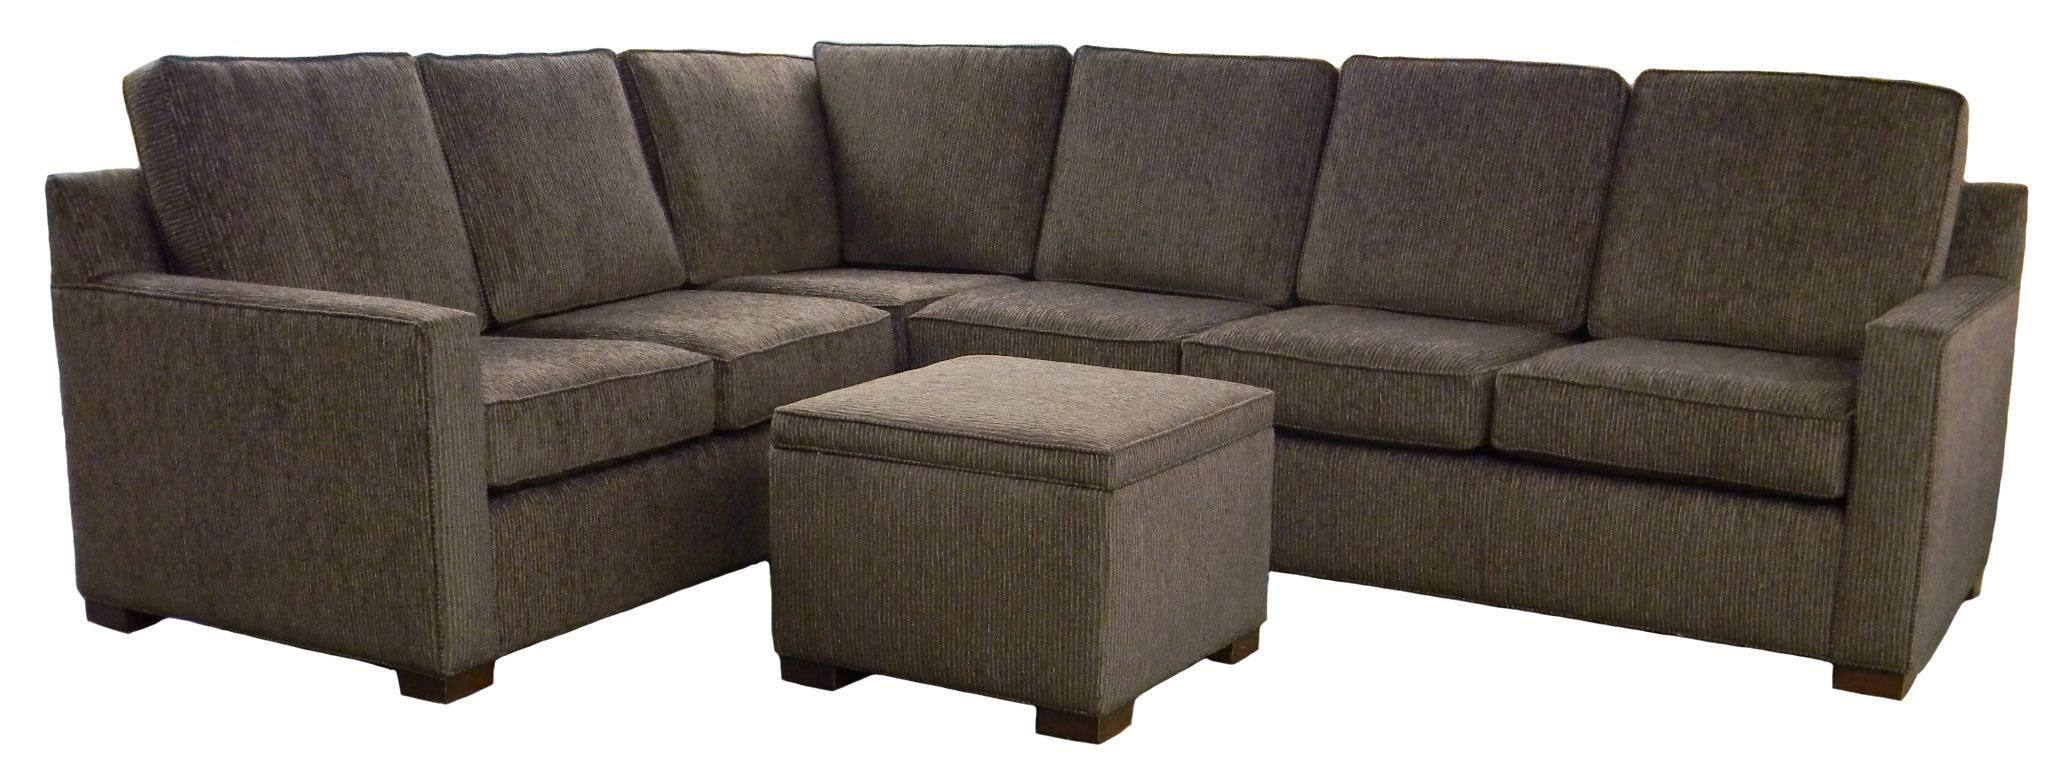 Hall sectional sofa hawthorne